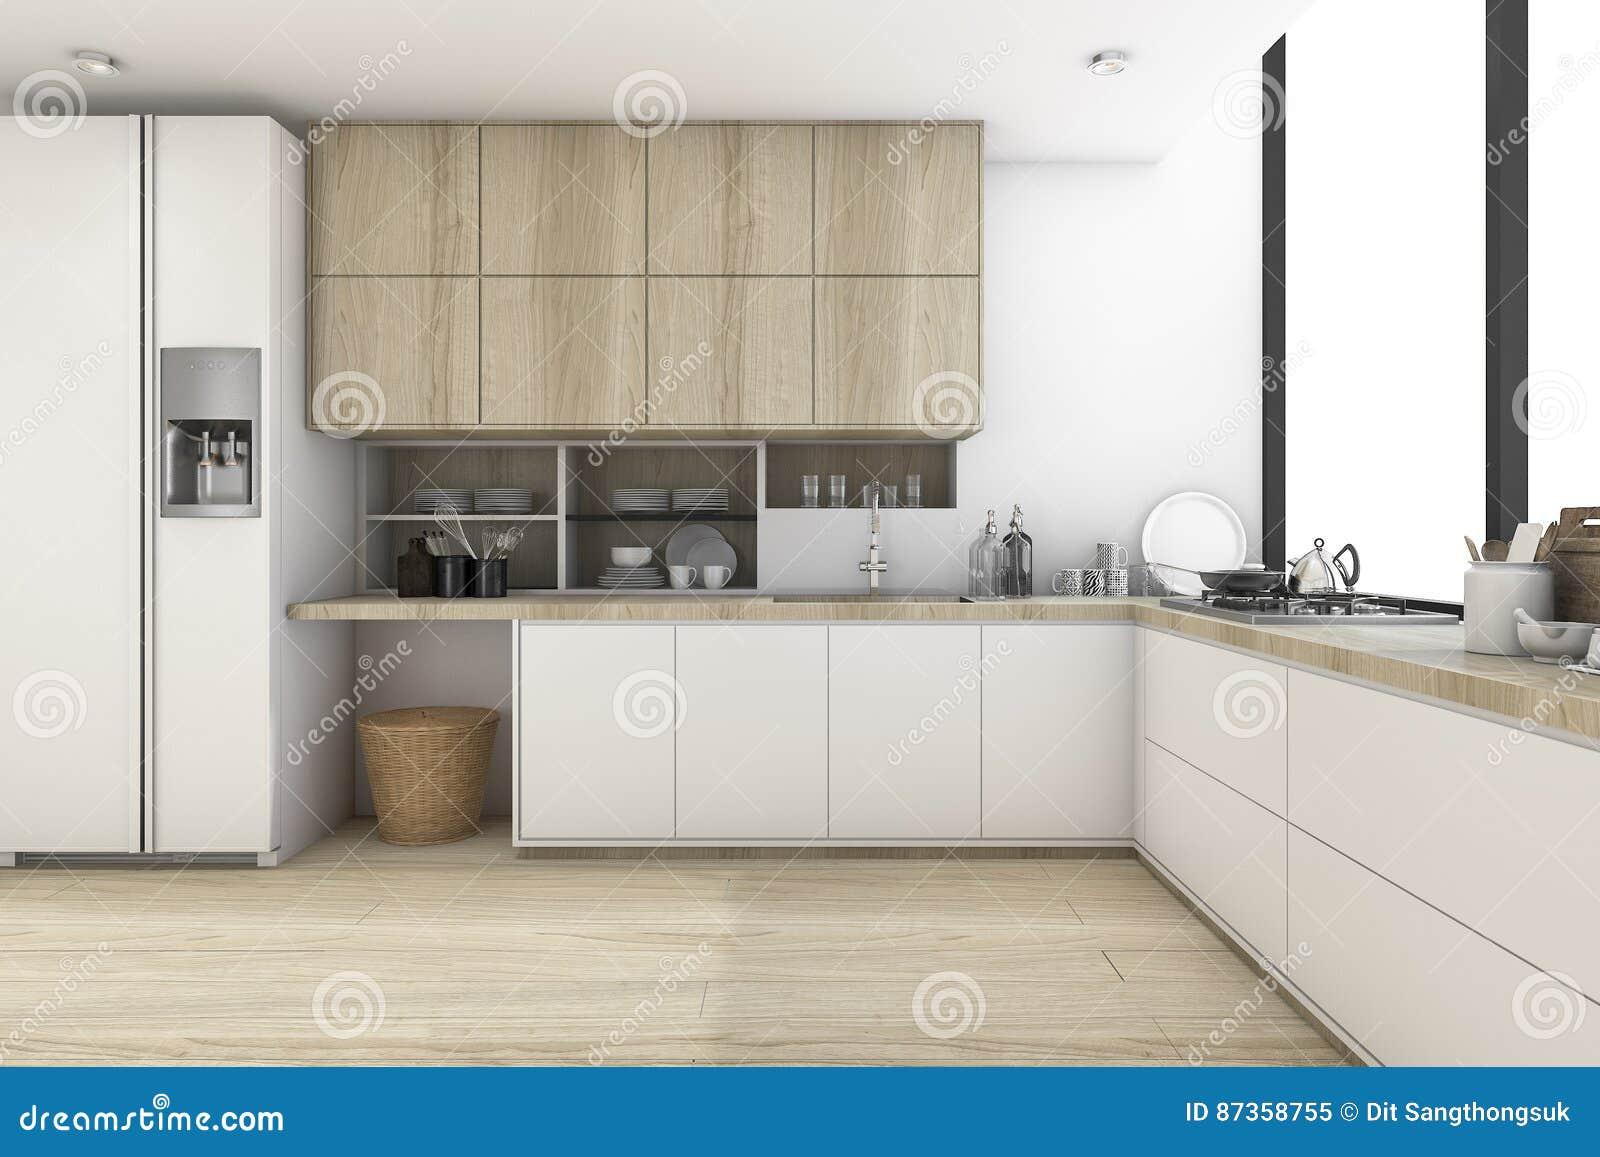 Progettare cucine 3d stunning fantastico cucine d simulazione d cucina progetto ida sh with - Software cucine 3d ...